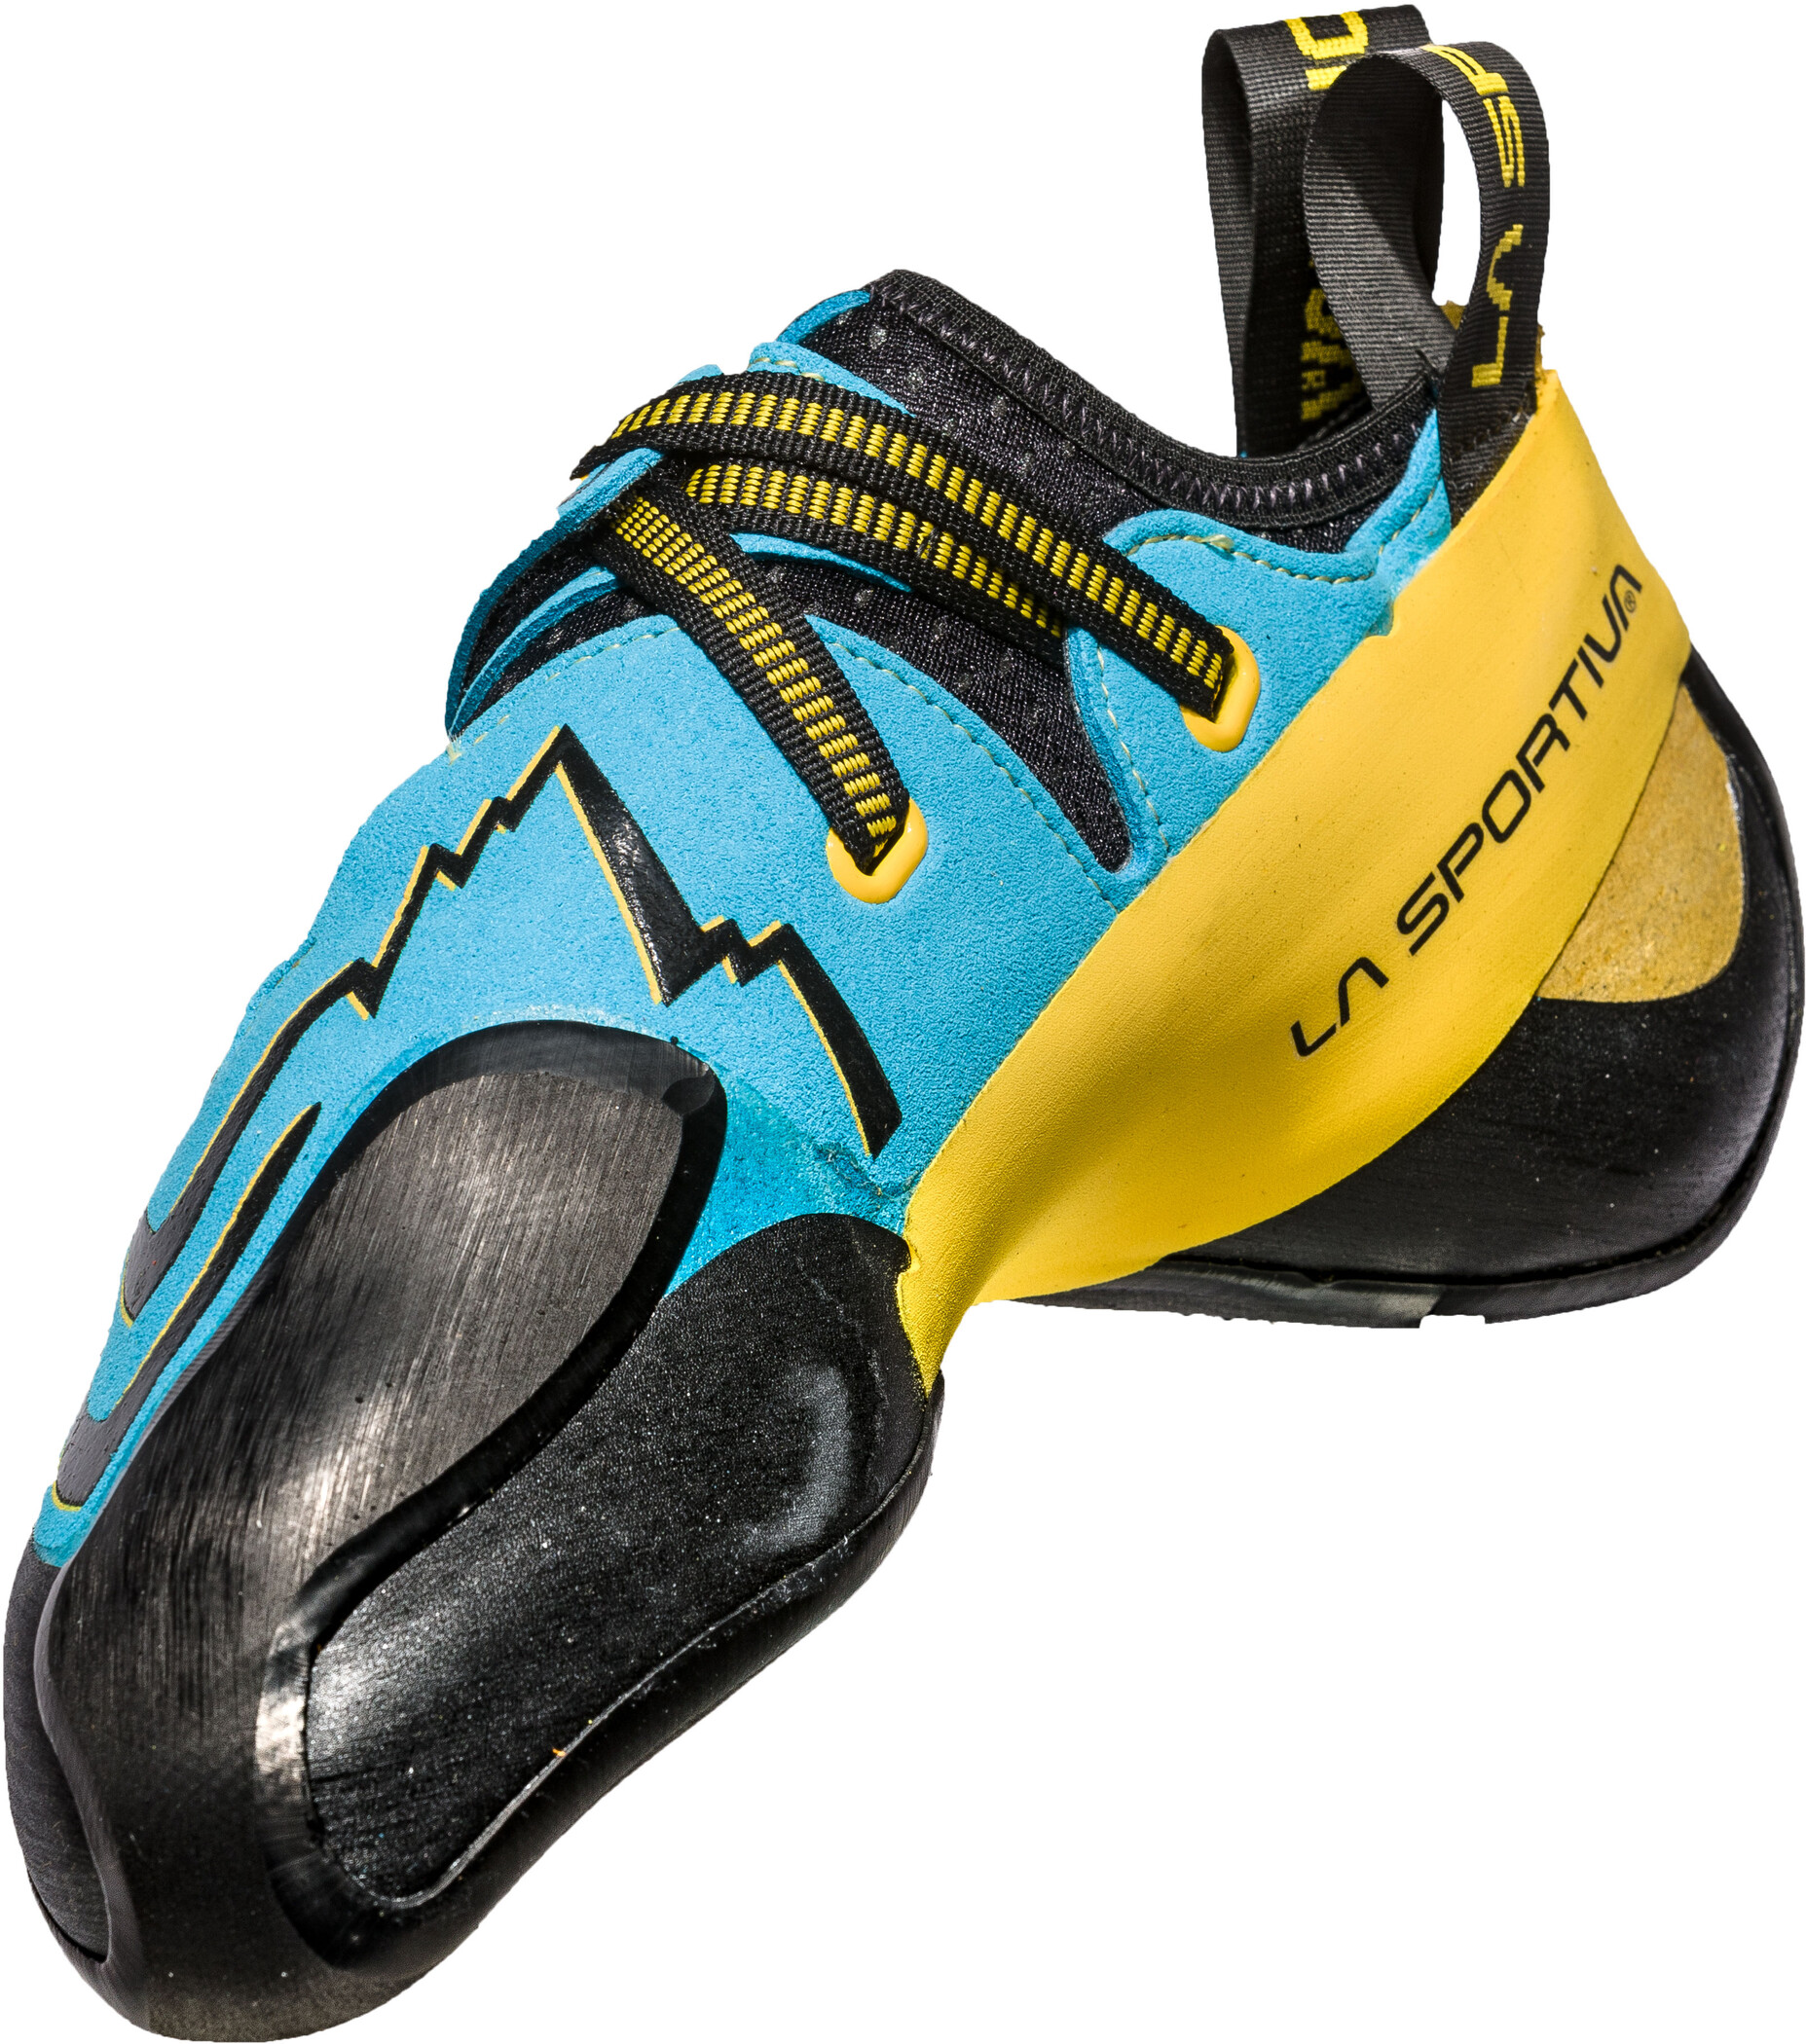 dac4a69549 https://www.addnature.com/la-sportiva-futura-climbing-shoes-men ...